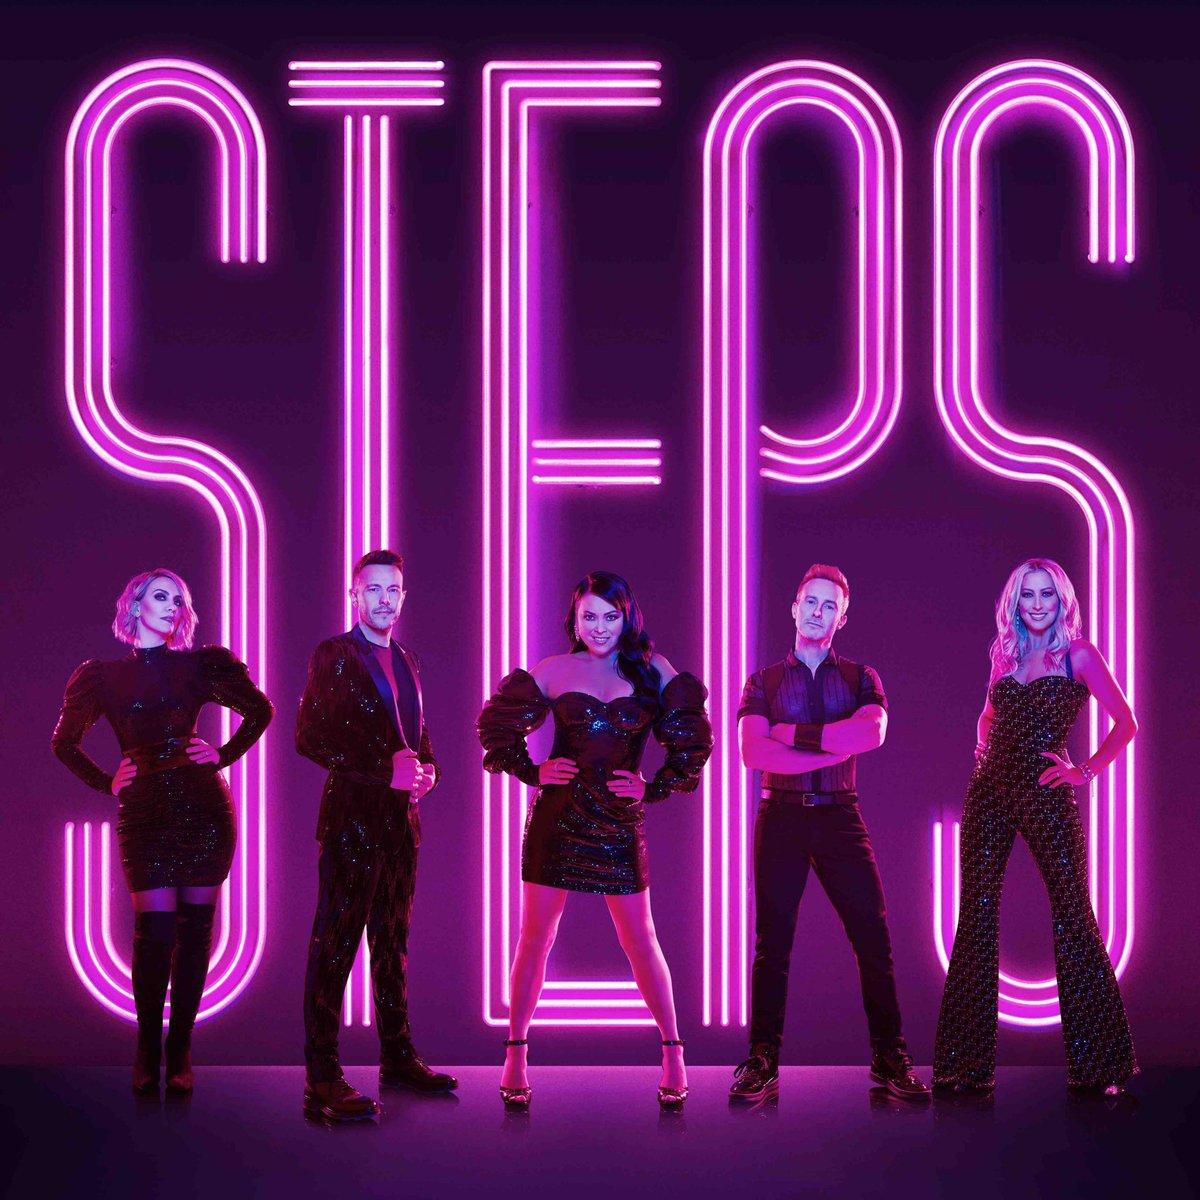 NEWS: ⭐ OFFICIAL STEPS MUSICAL IN-DEVELOPMENT ⭐  Read more - https://t.co/BspJqI4DCv https://t.co/HtP4q0Q4GP